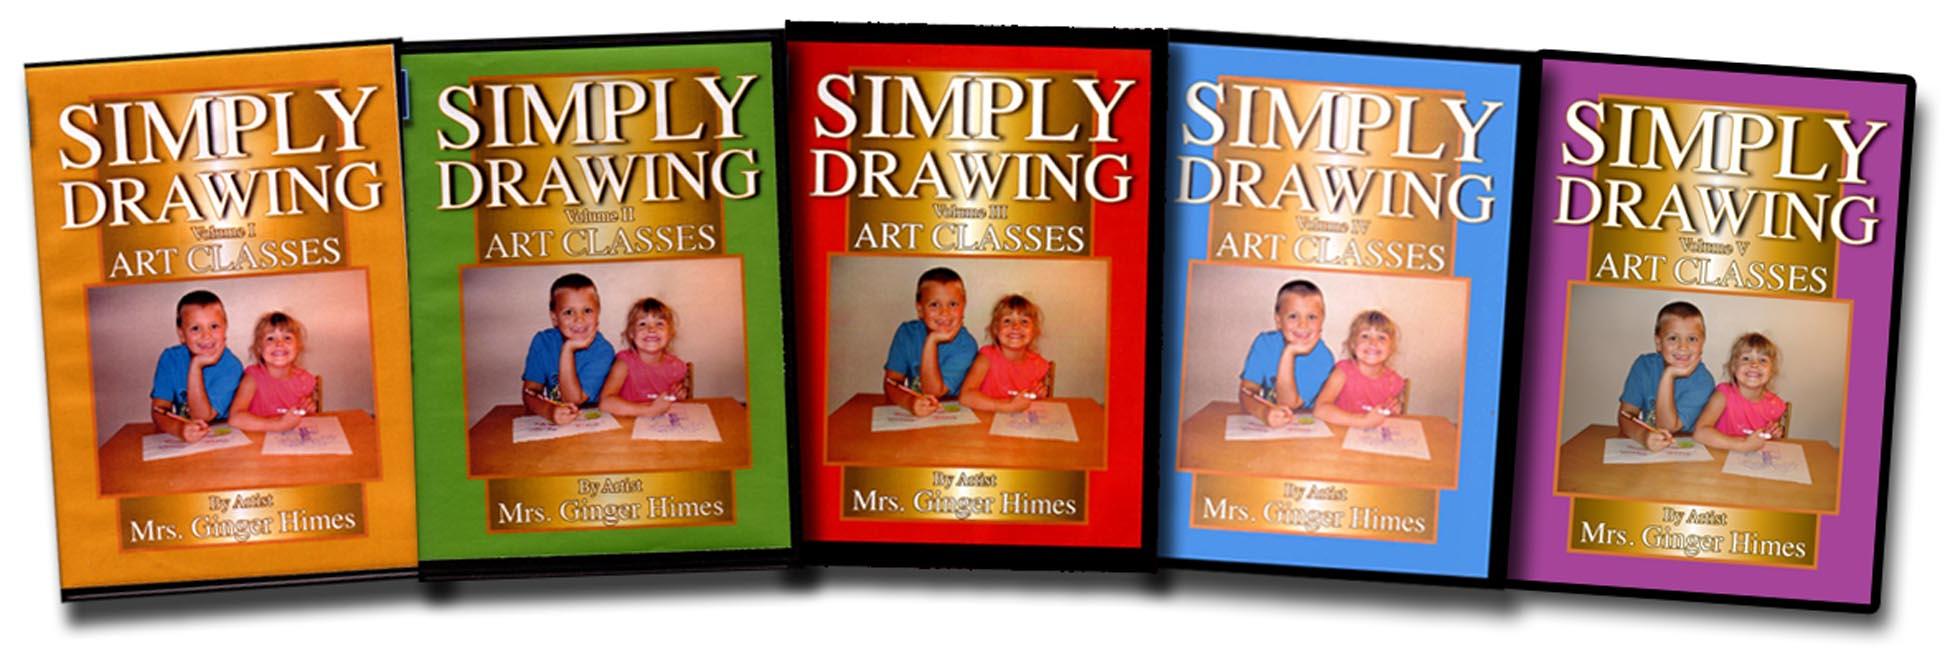 Simply Drawing Vol. 1-5 Set